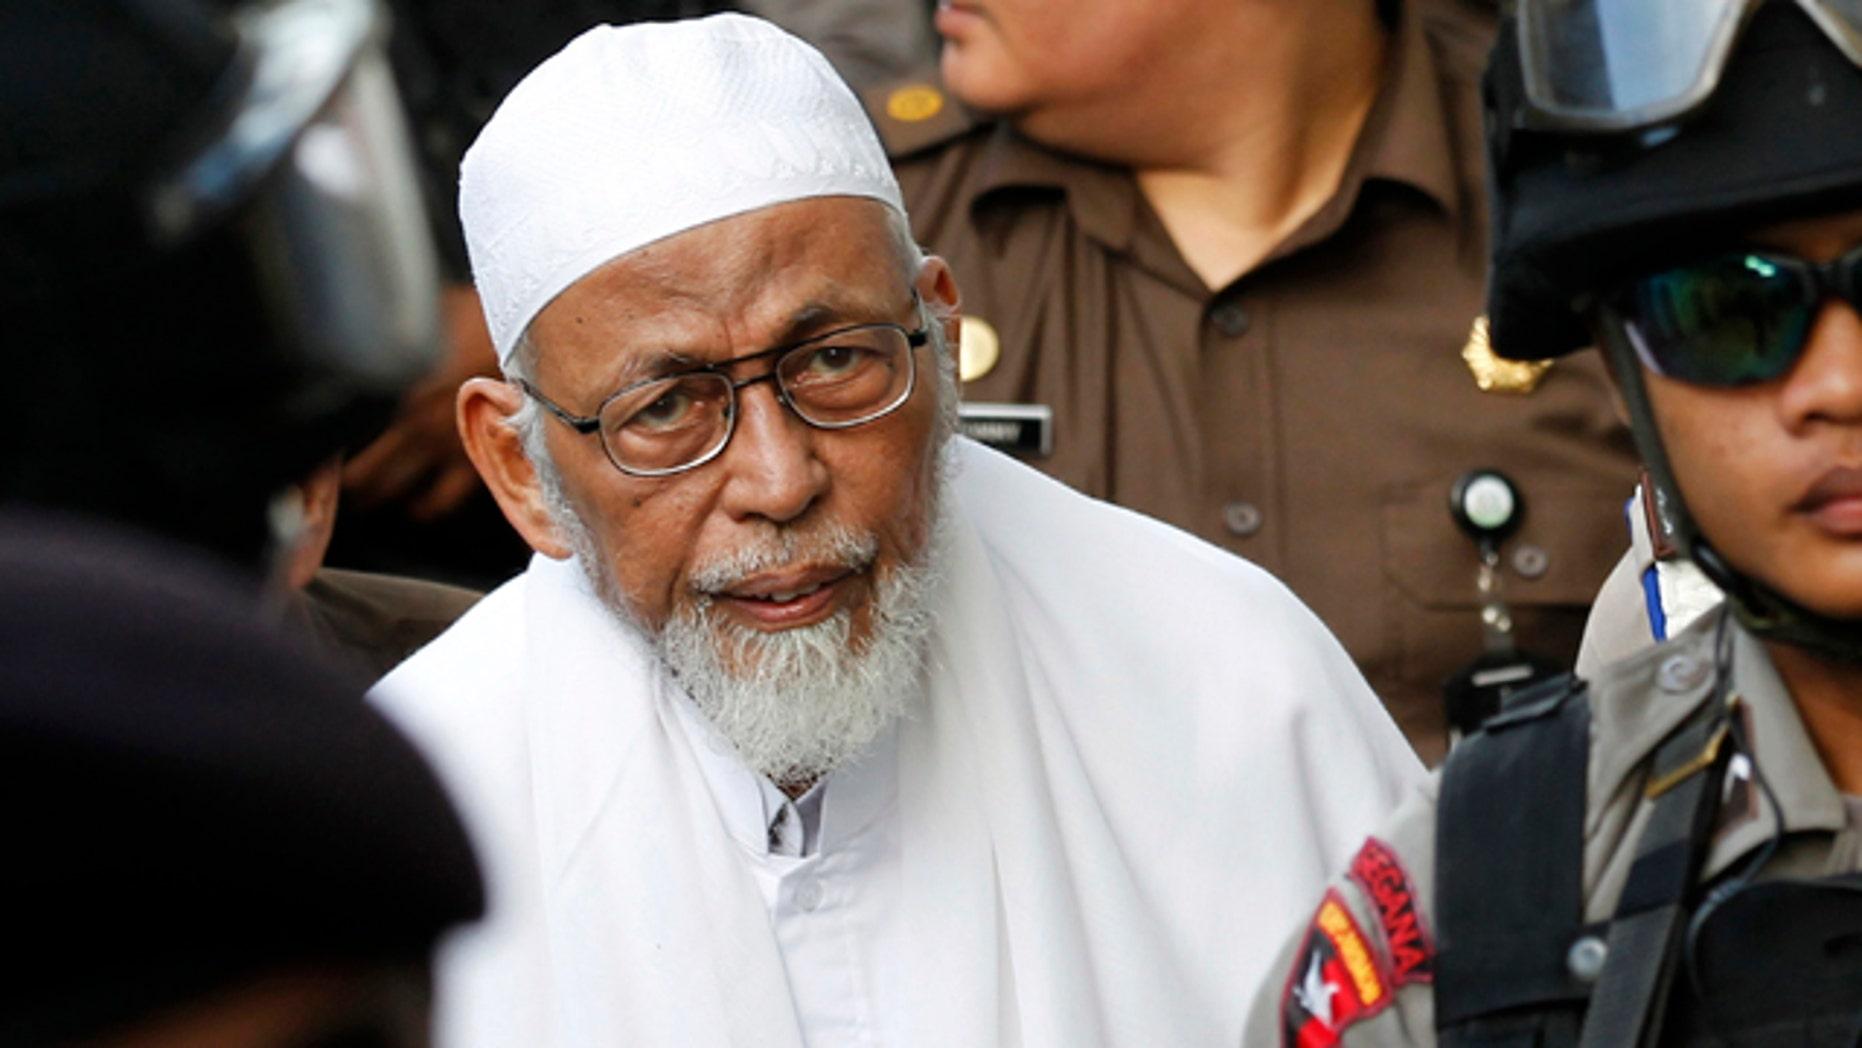 March 14, 2011: Radical Indonesian Muslim cleric Abu Bakar Bashir arrives at south Jakarta's court compound.